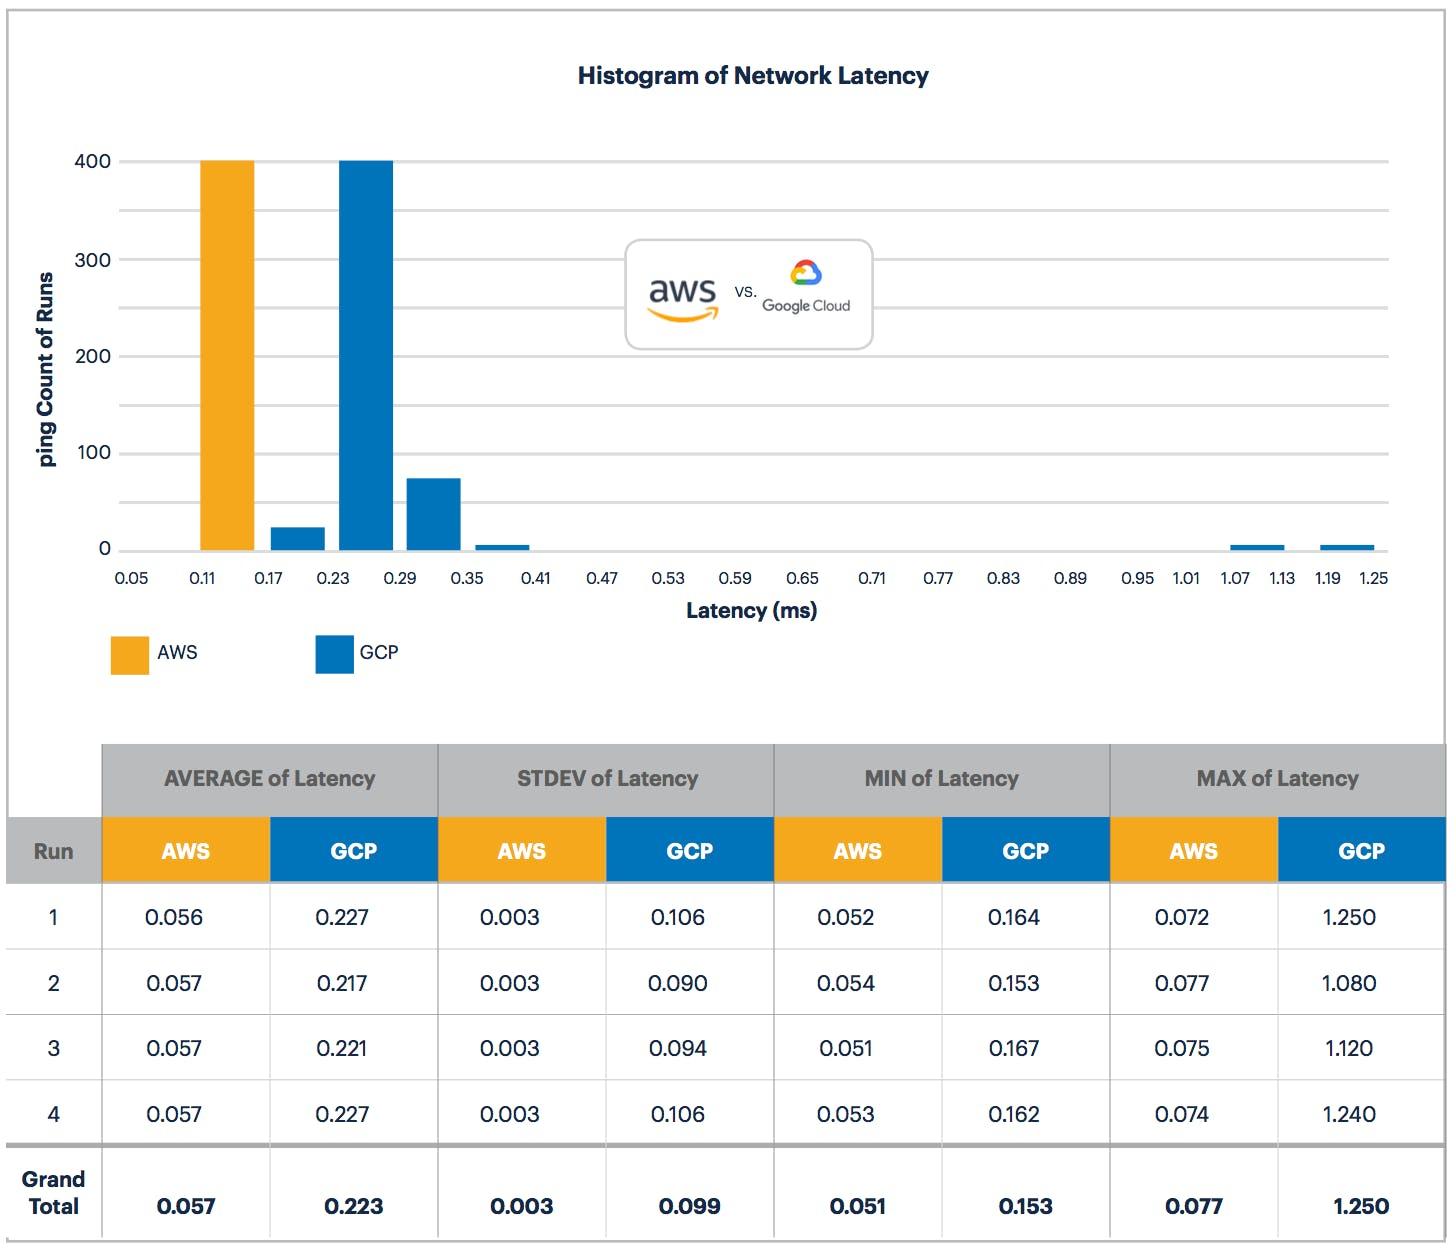 AWS vs GCP: Network Latency Histogram